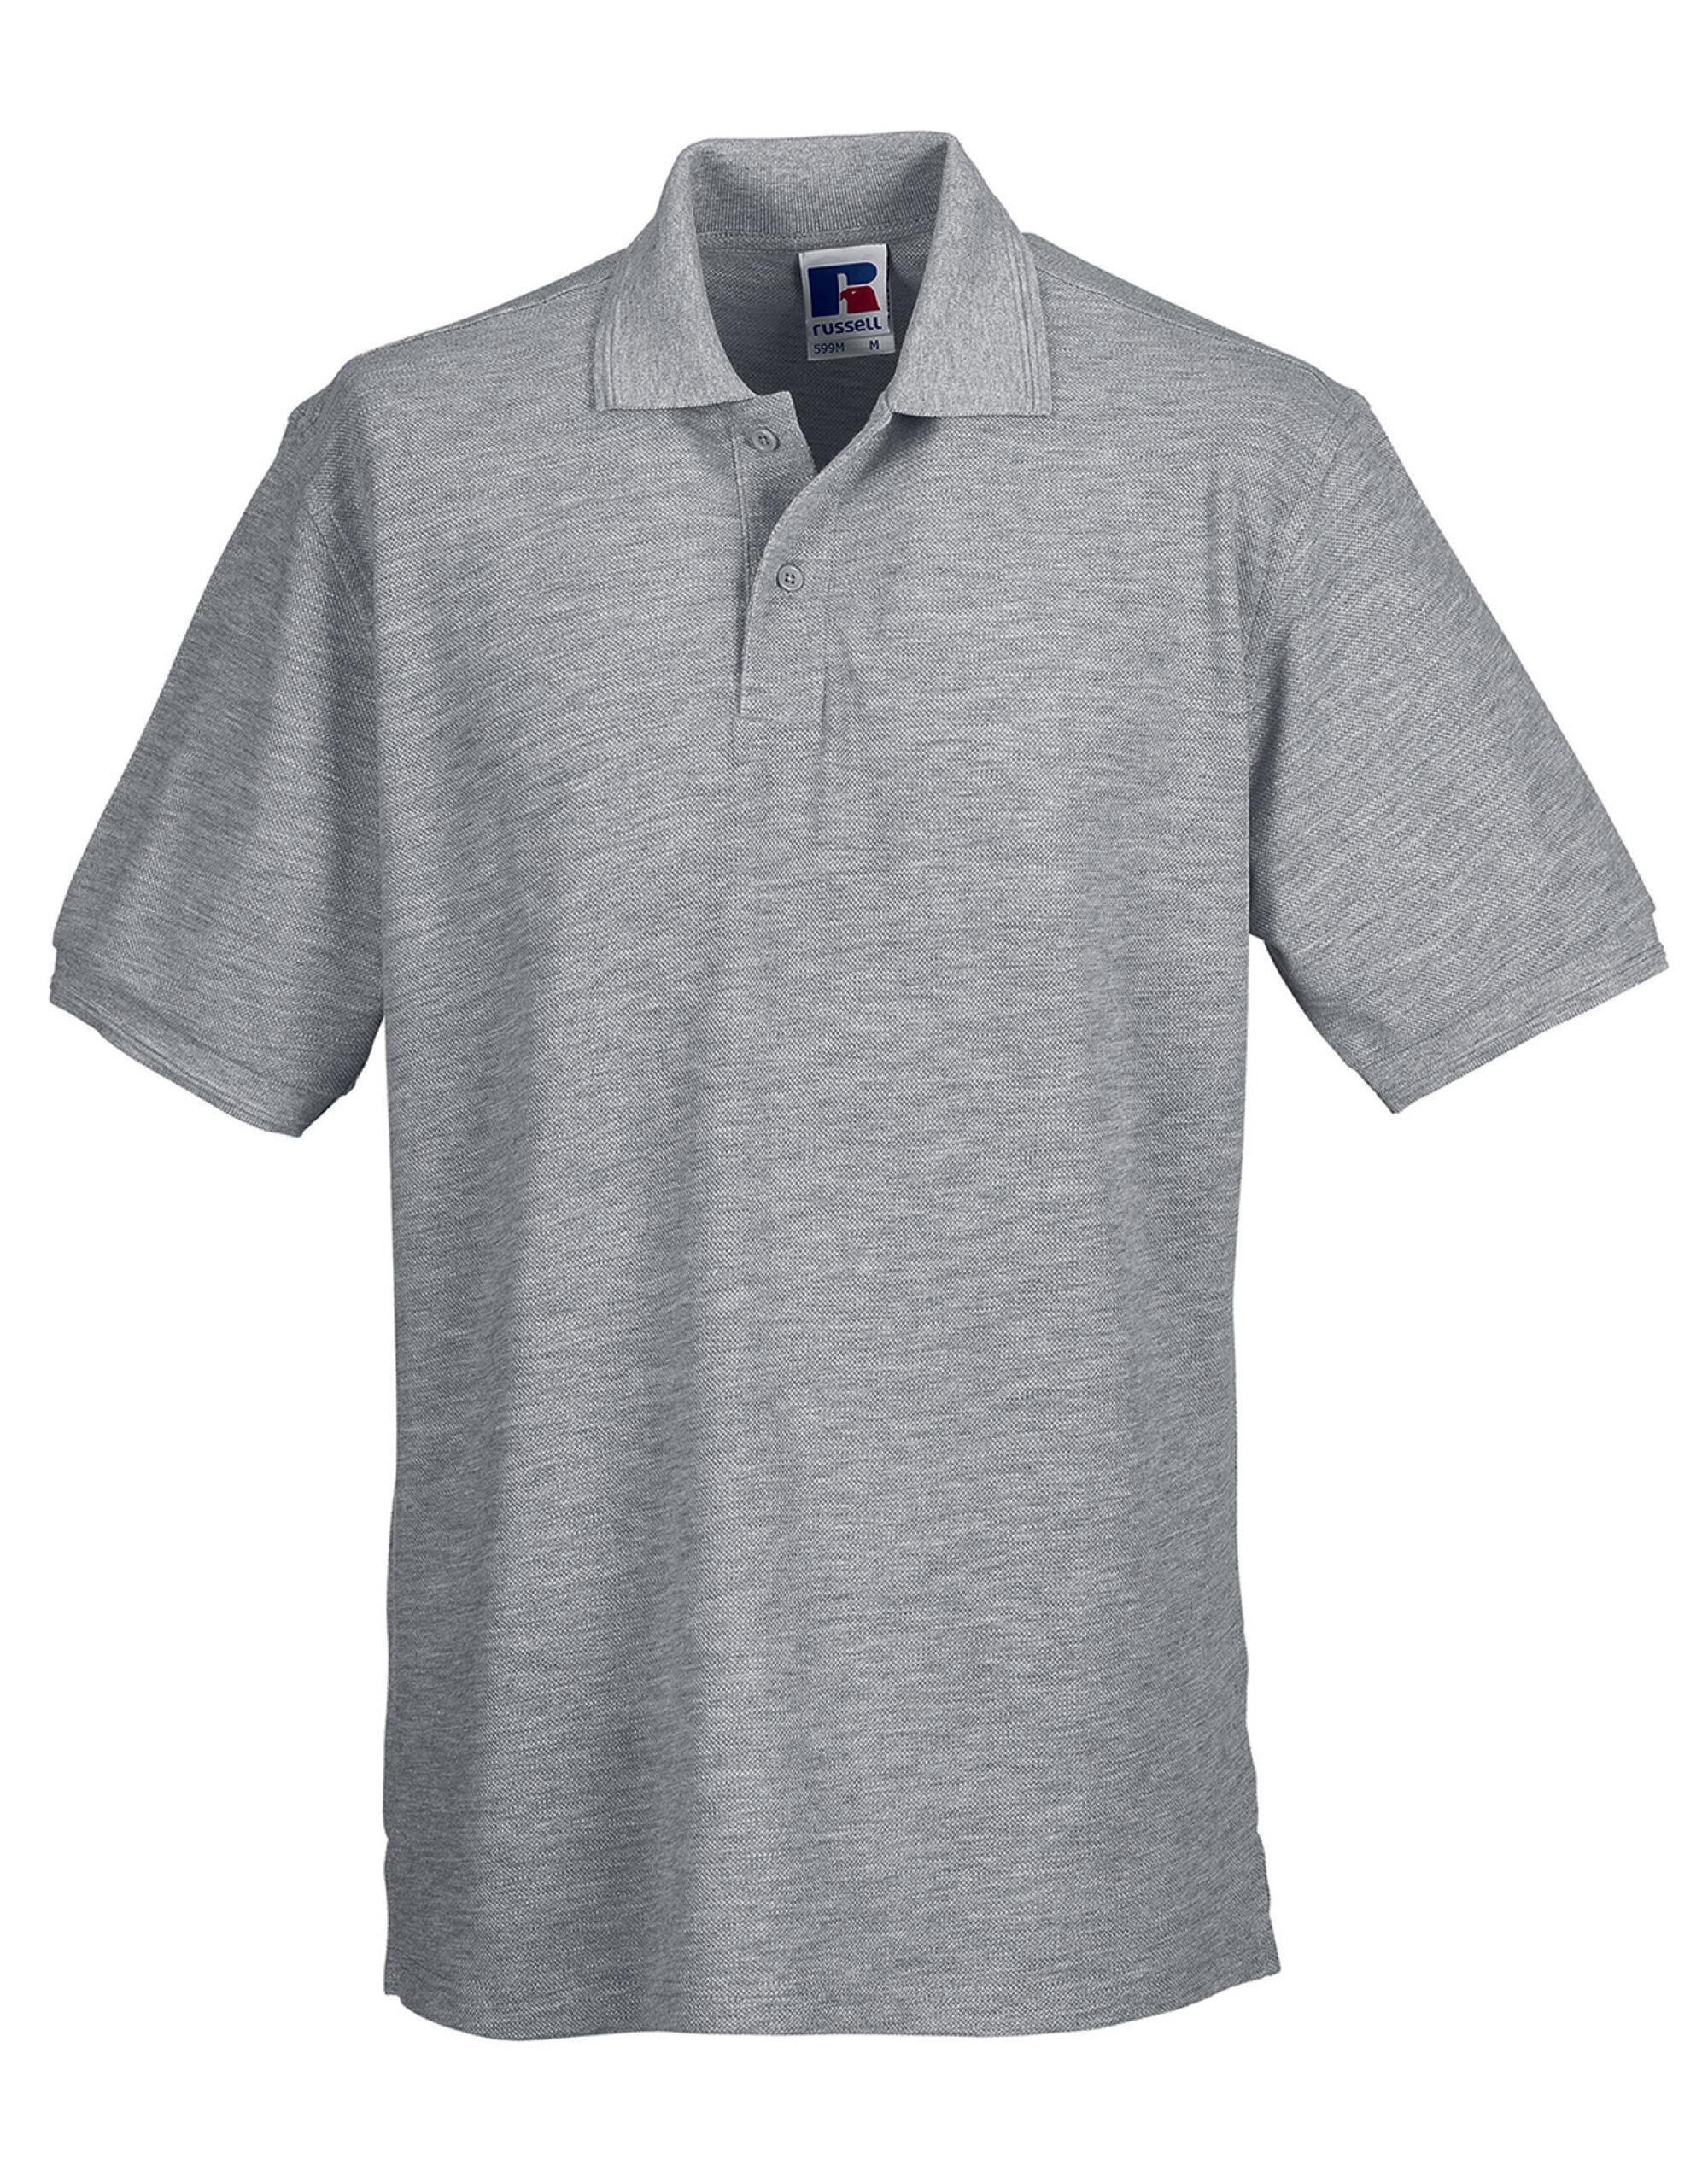 Hardwearing Polo Shirt